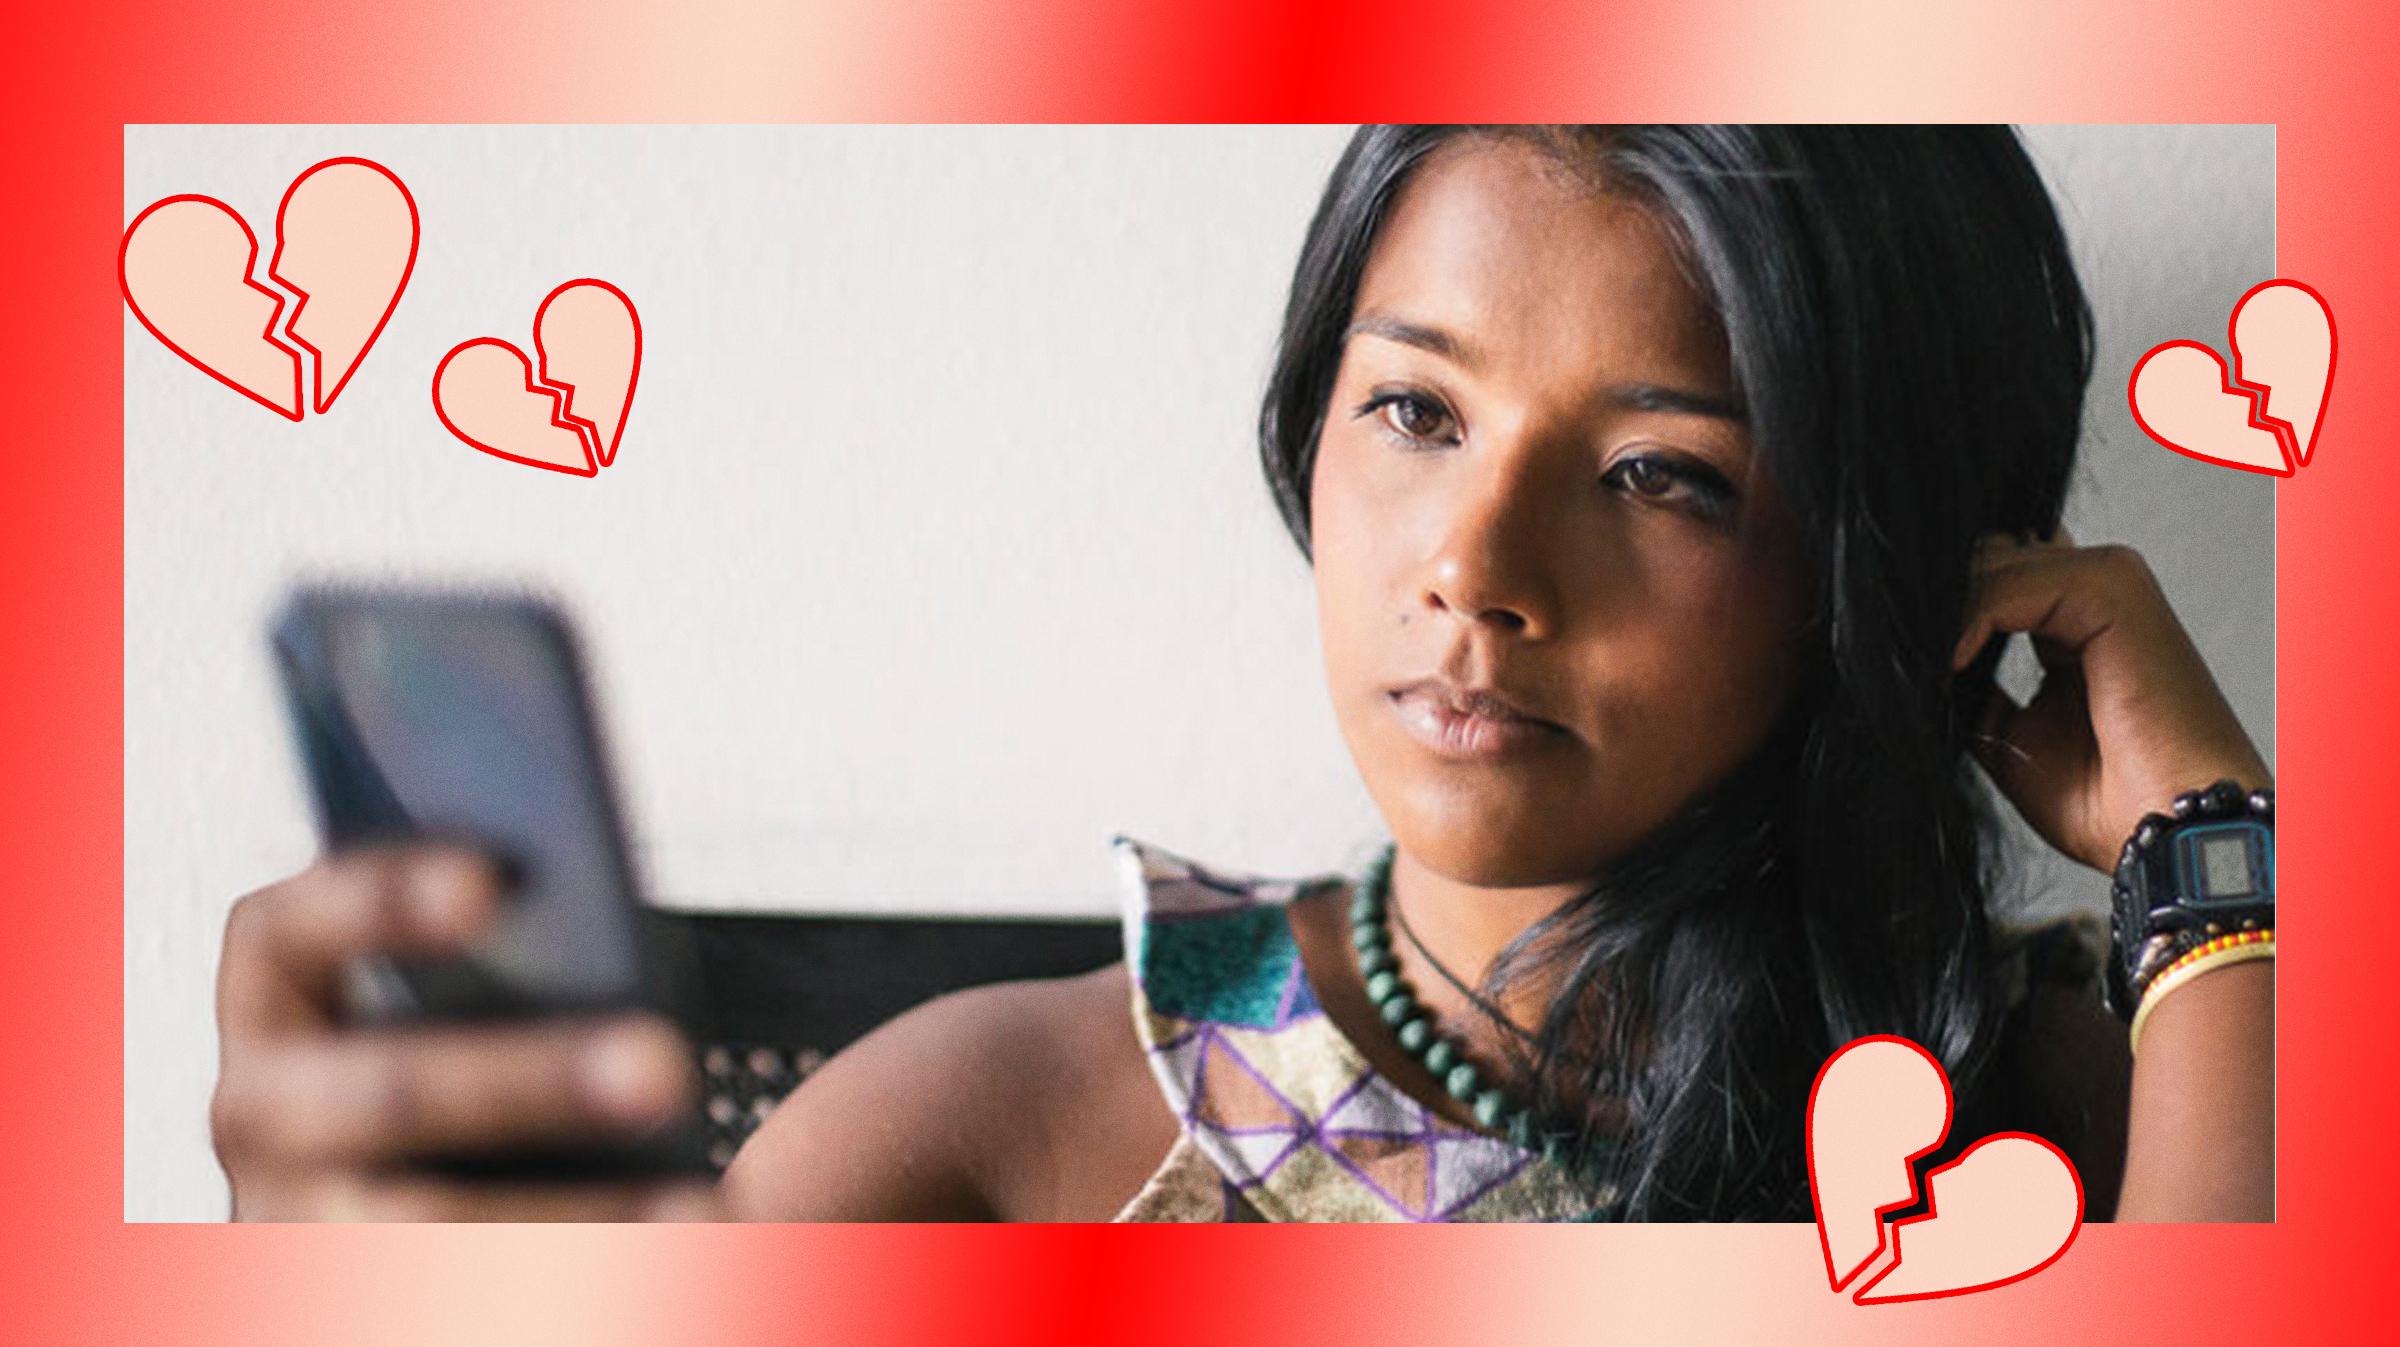 The Post-Breakup Guide To Social Media - VICE